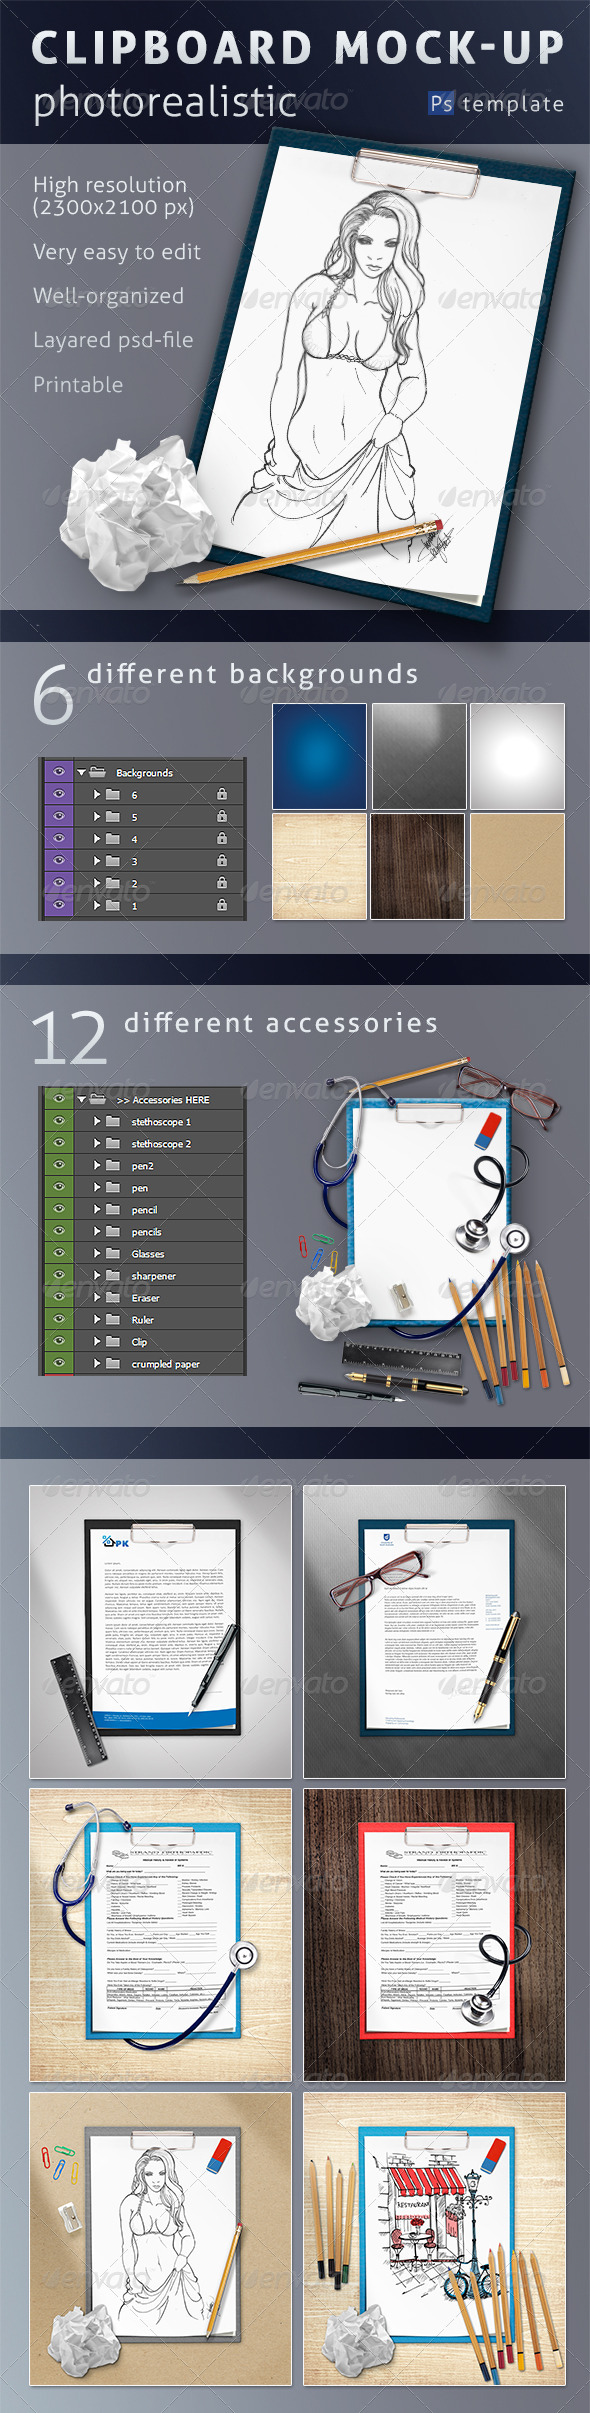 Photorealistic Clipboard Mock-up - Product Mock-Ups Graphics